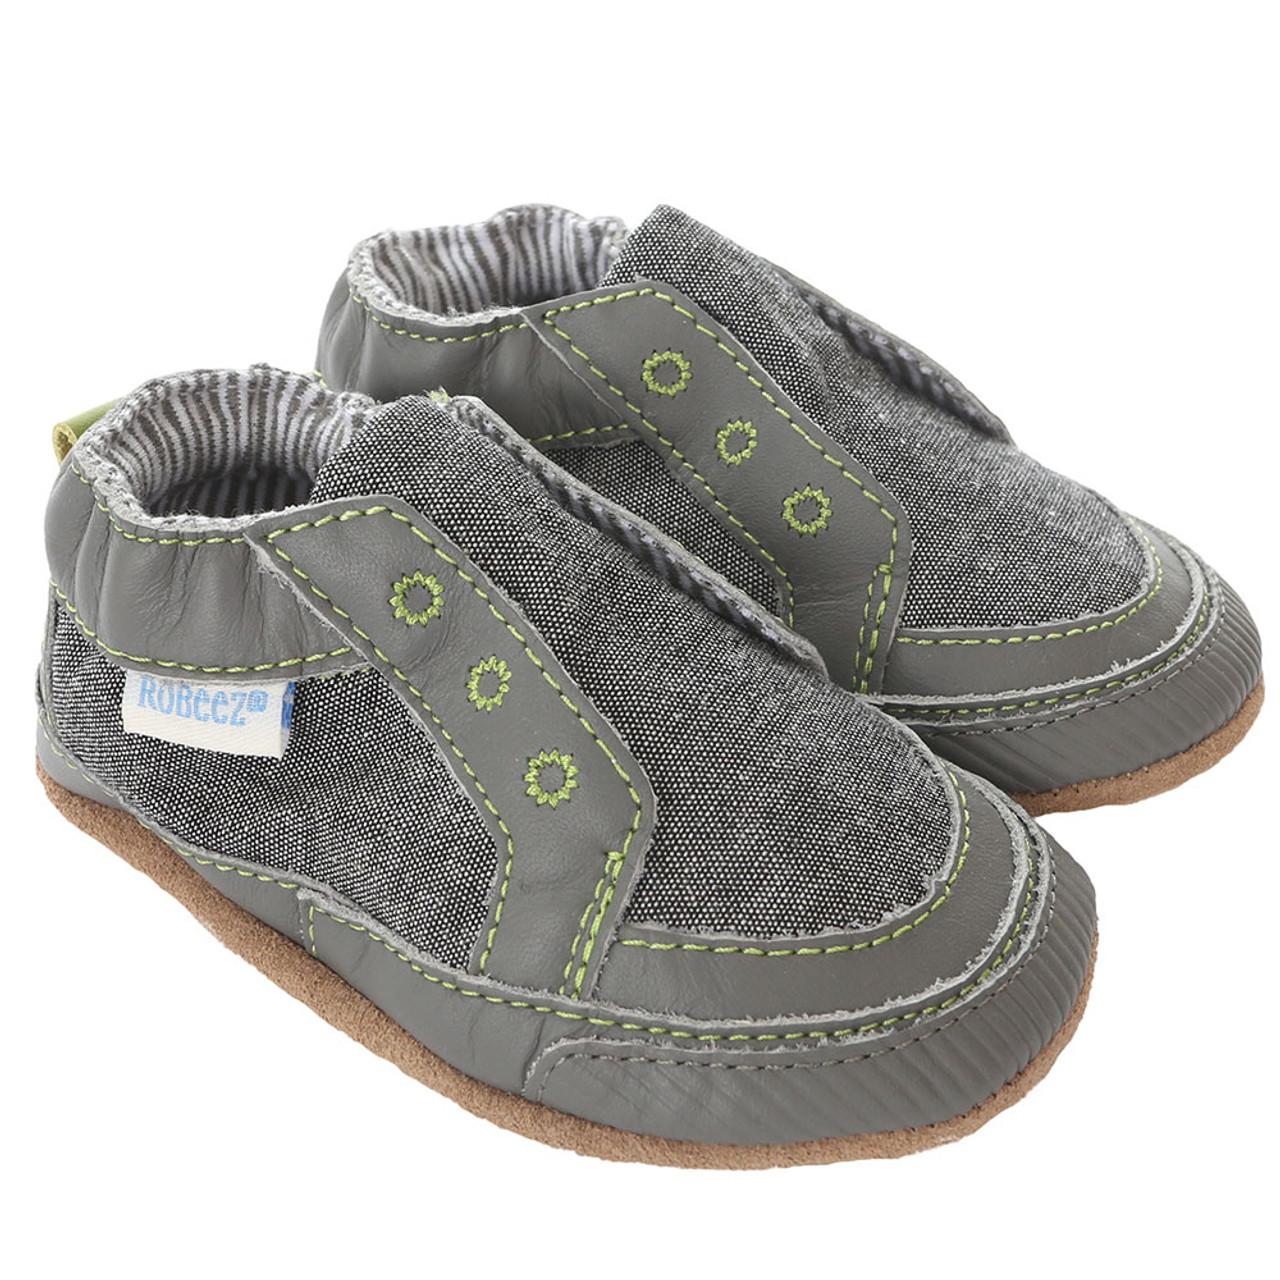 Robeez Mini Shoez Infant Boy's Stylish